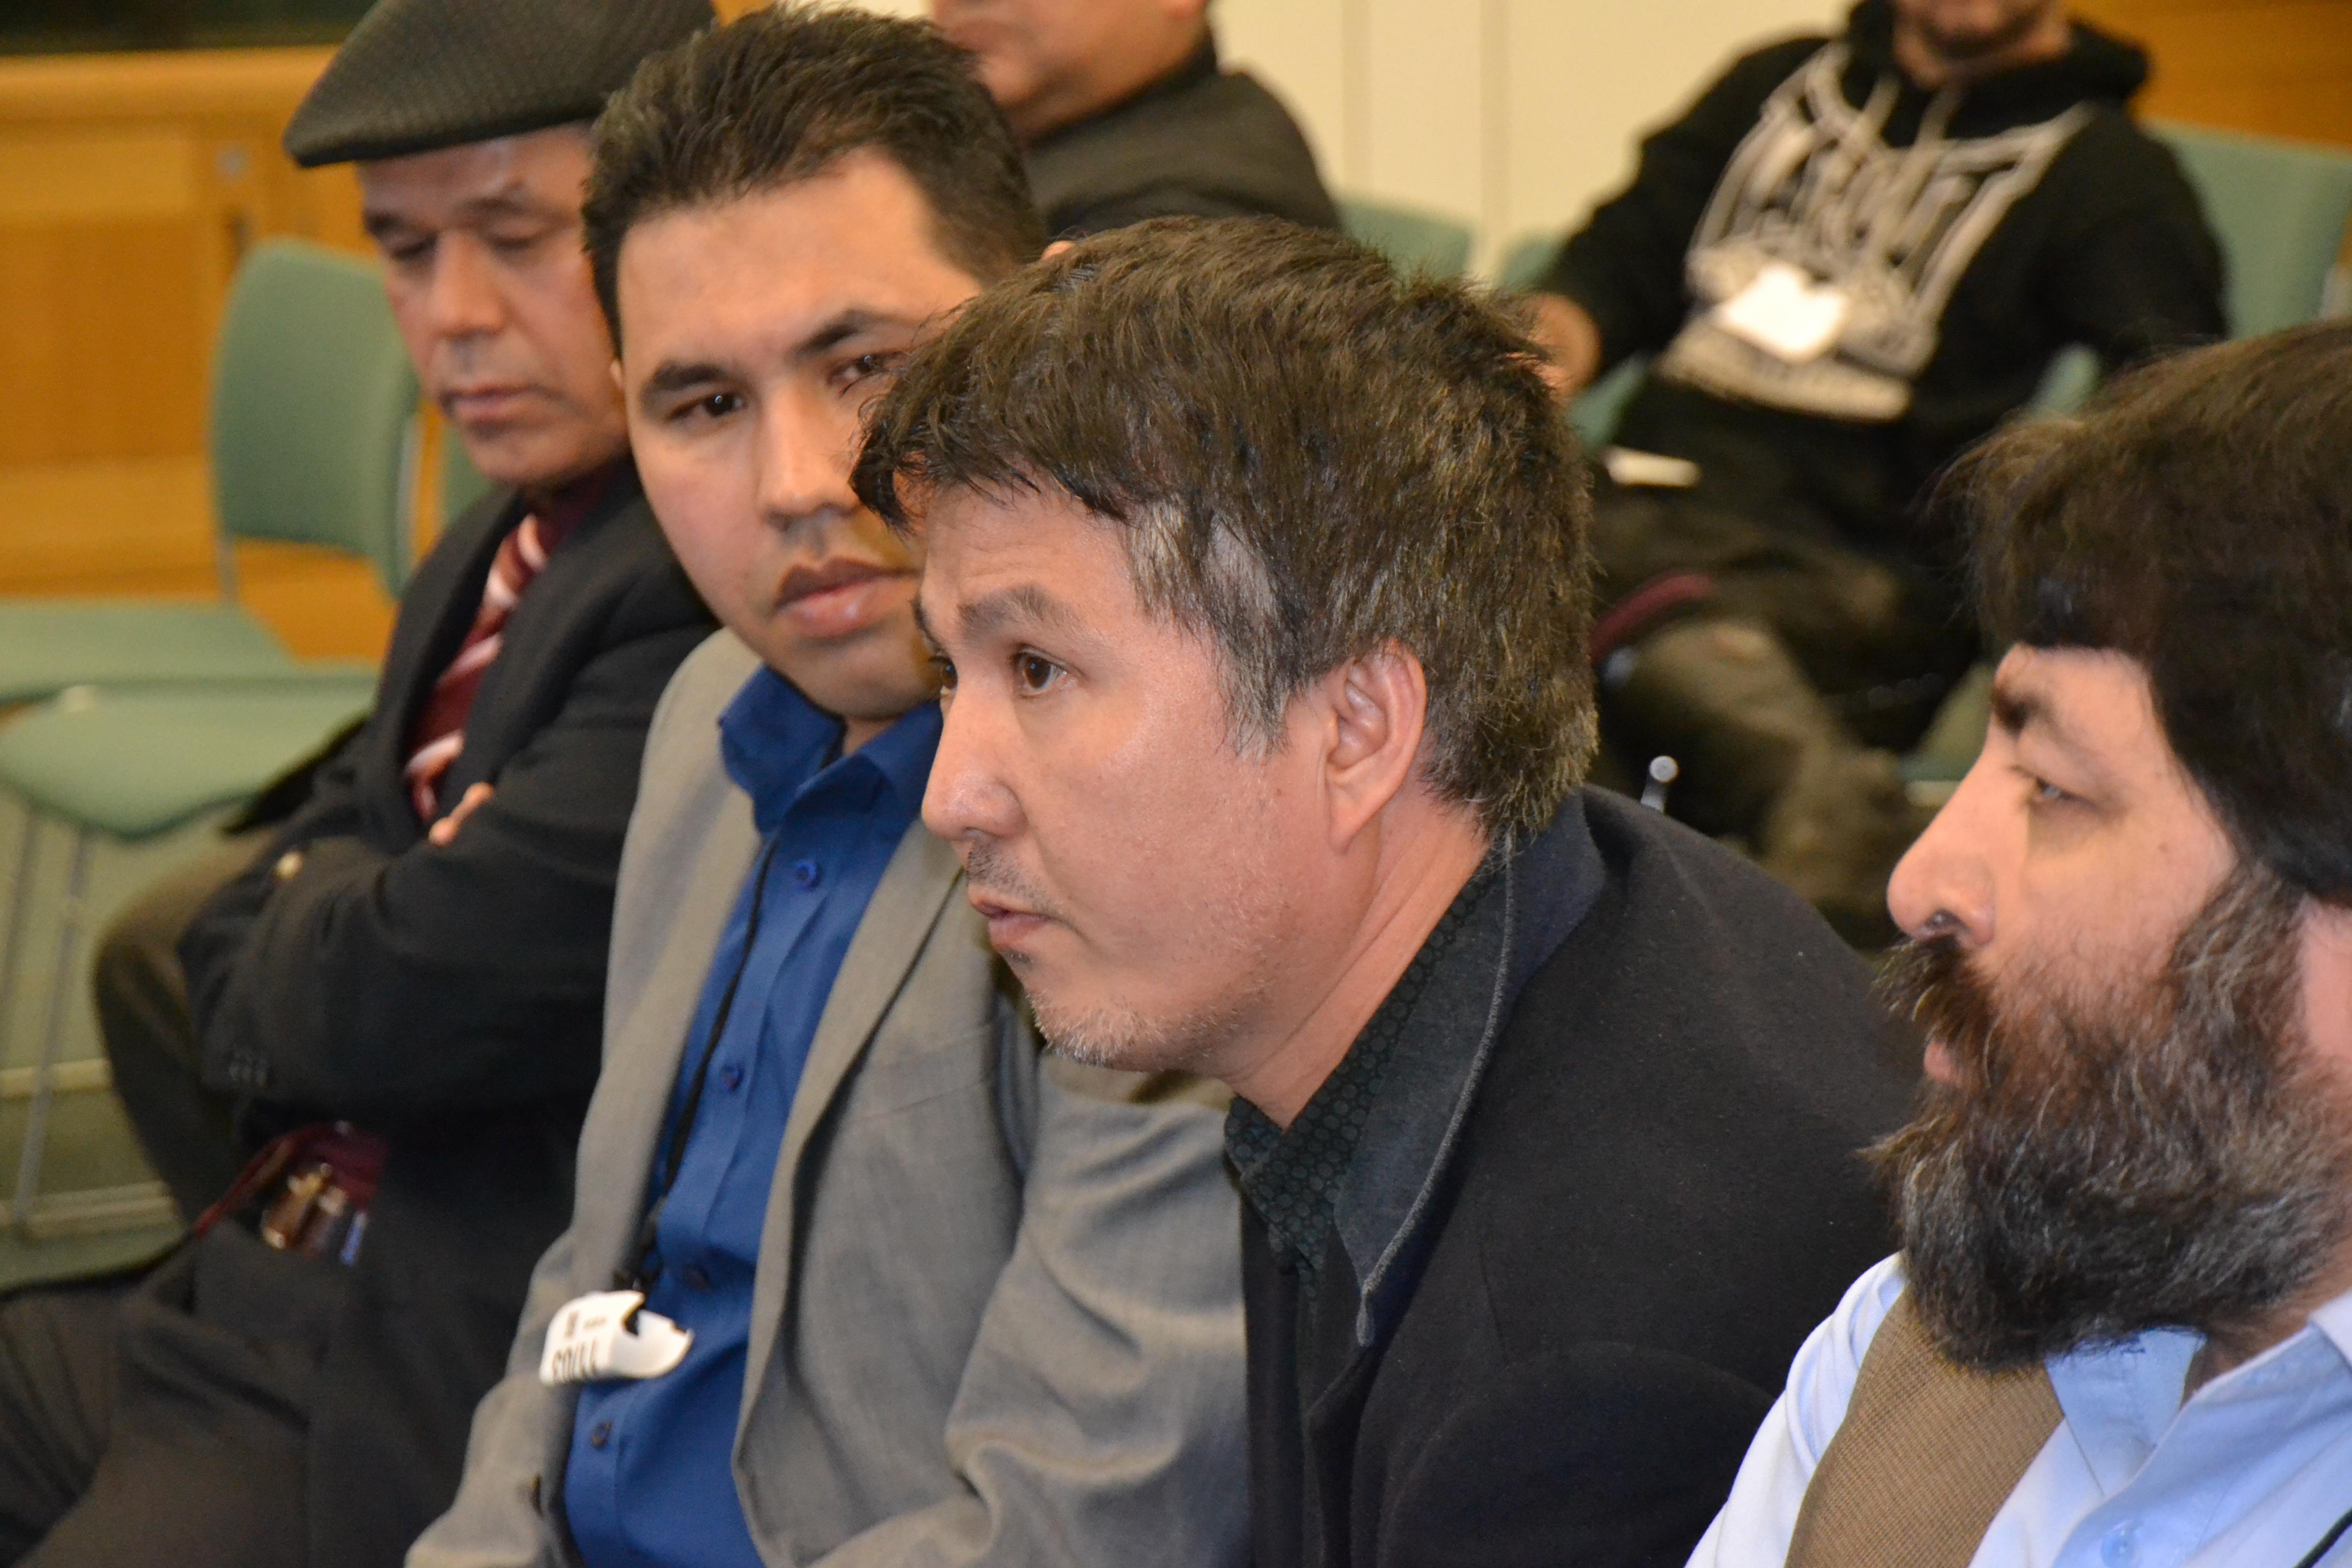 Attendees listening attentively